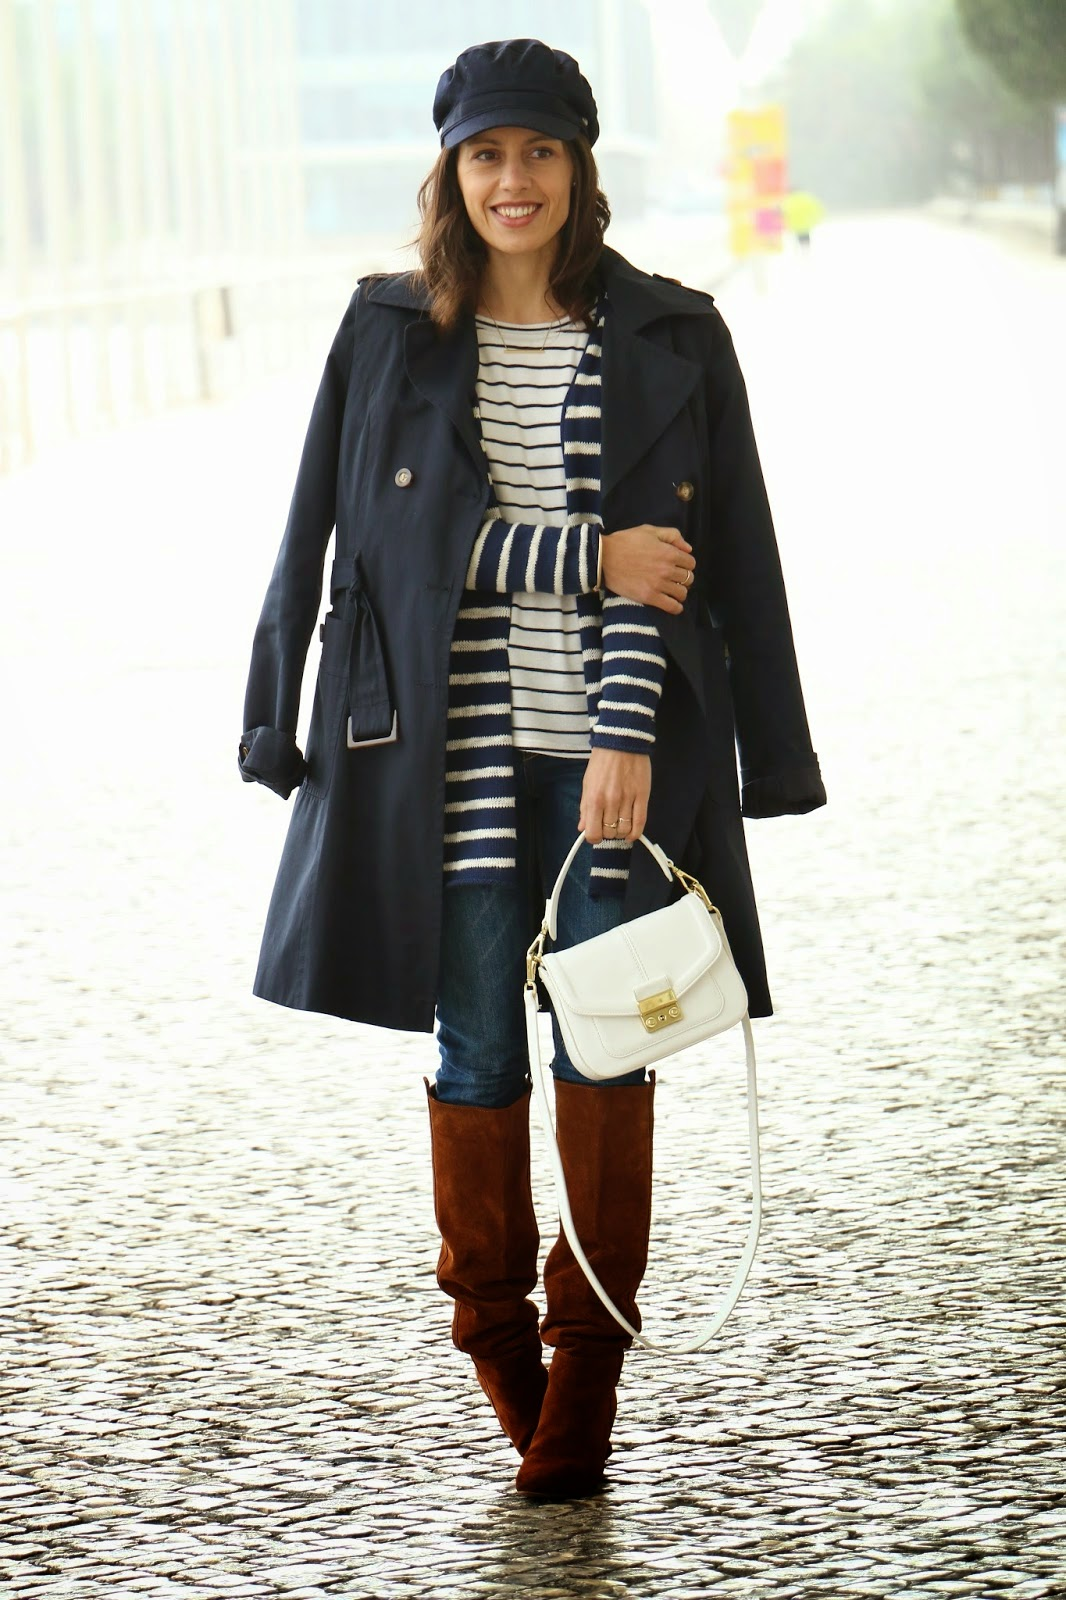 http://ilovefitametrica.blogspot.pt/2015/01/stripes-over-stripes.html